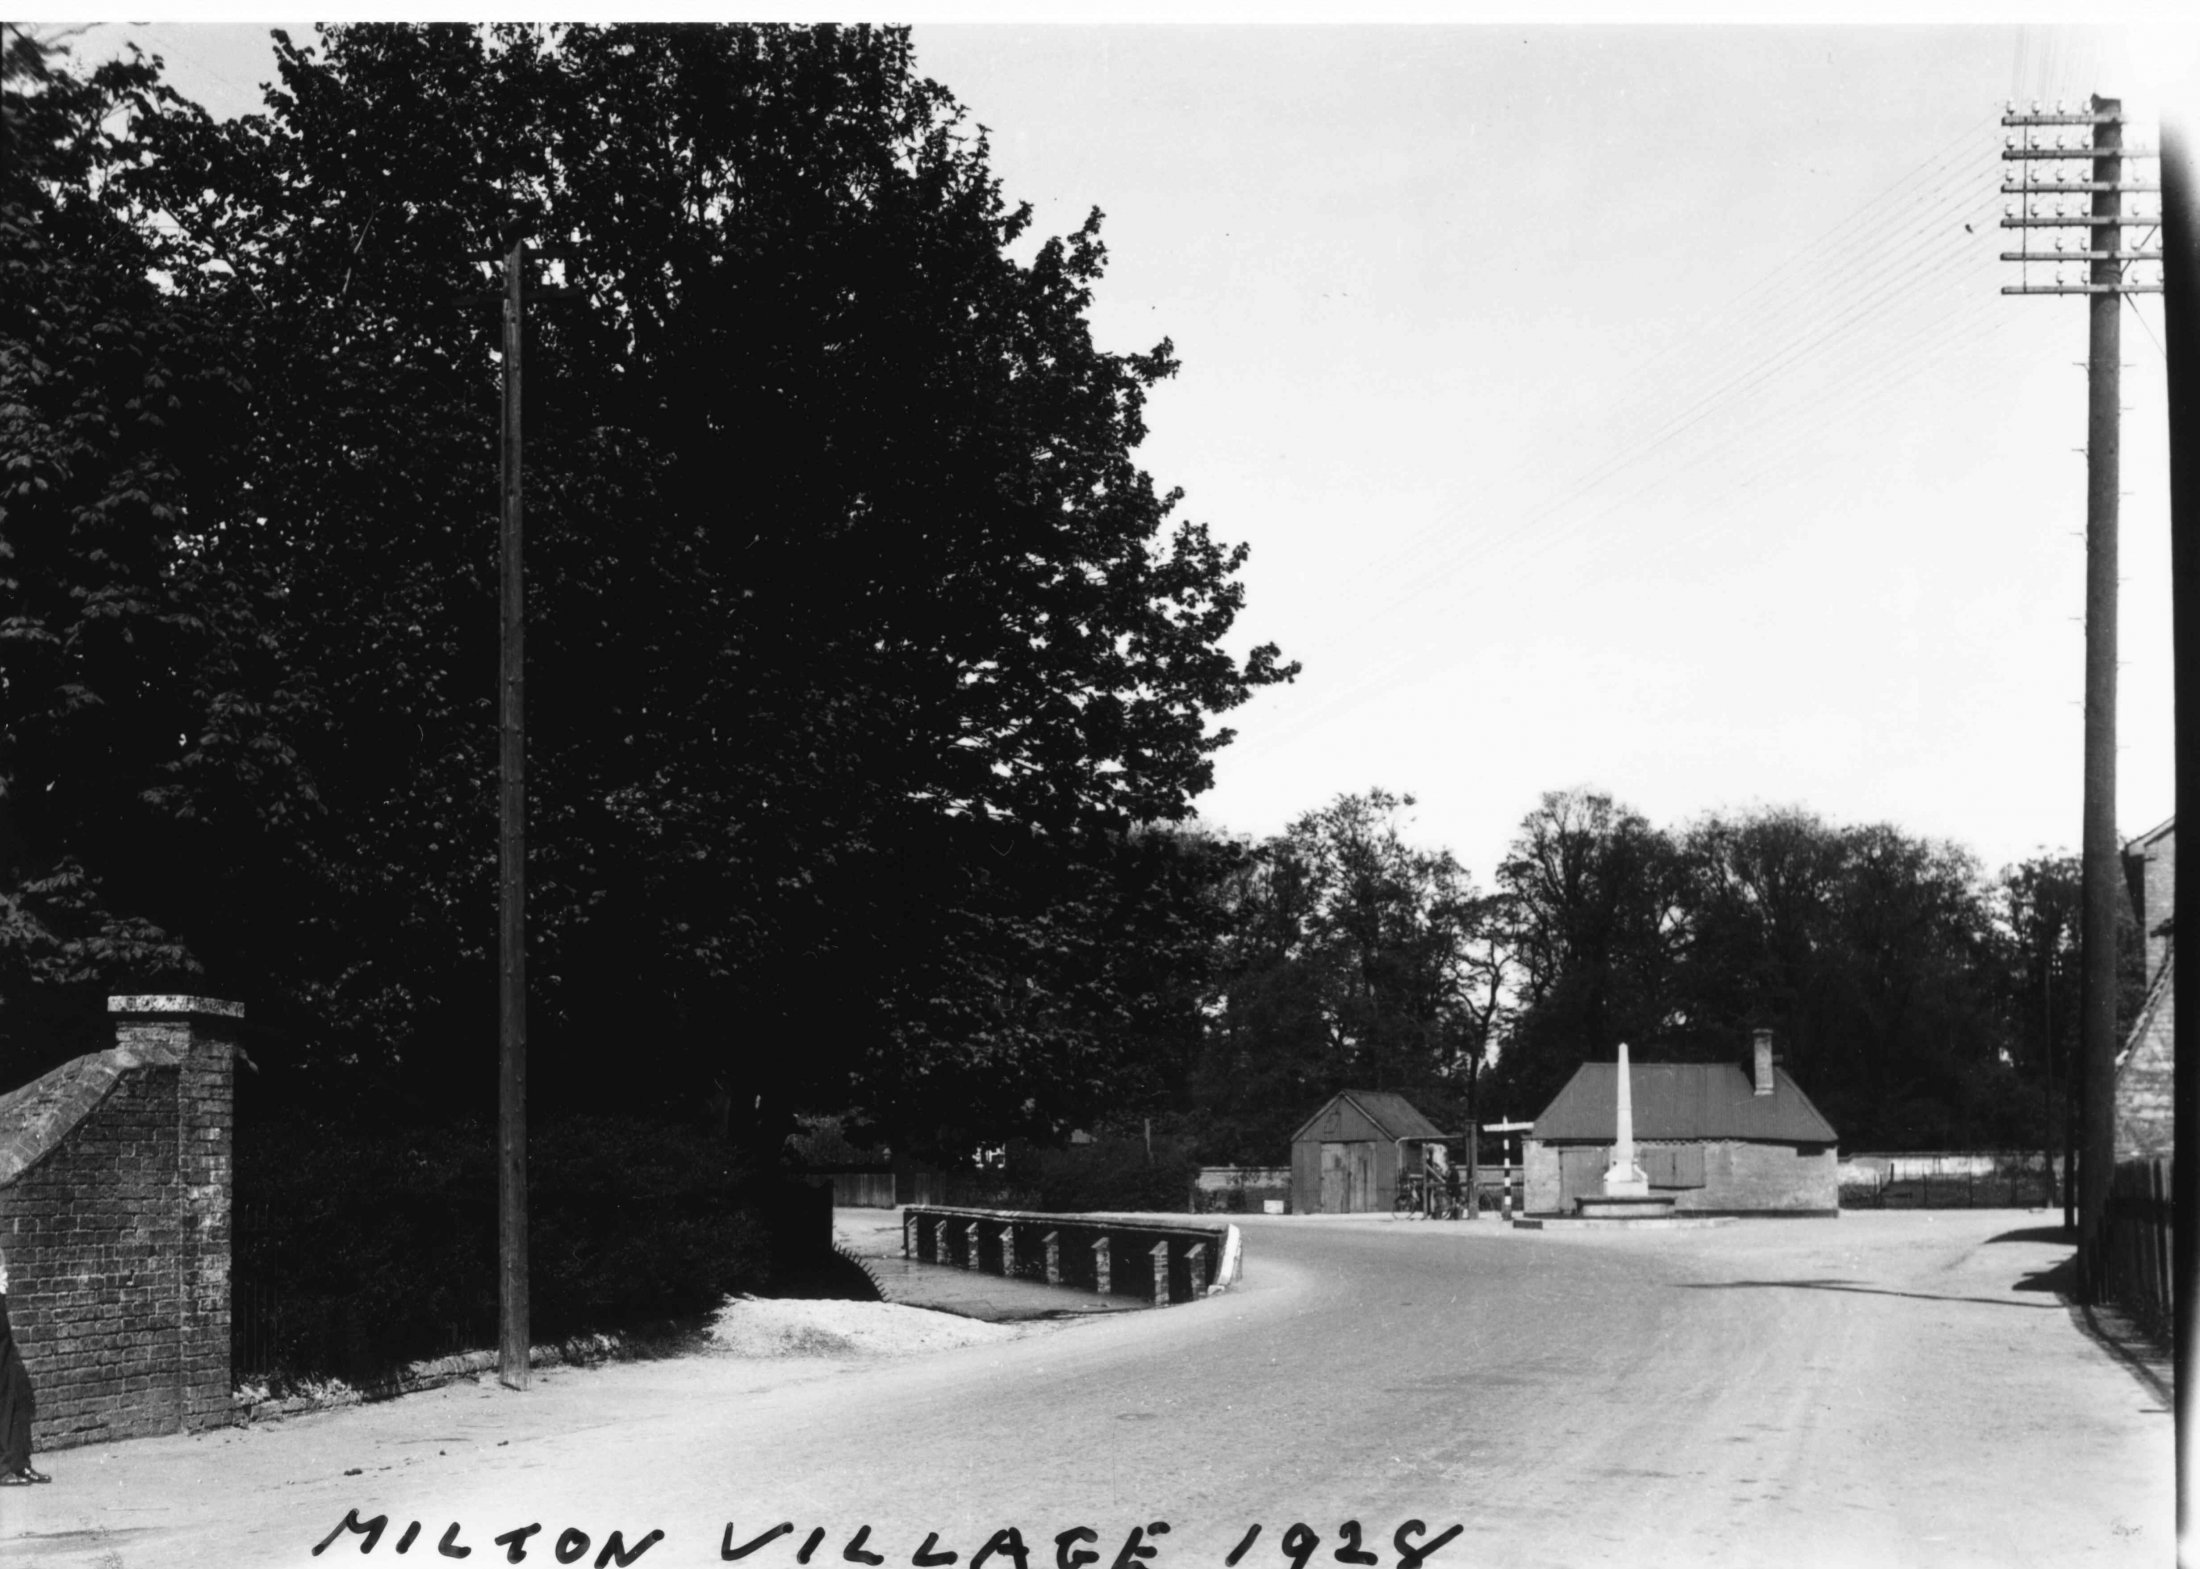 Milton Village With Pond 1928